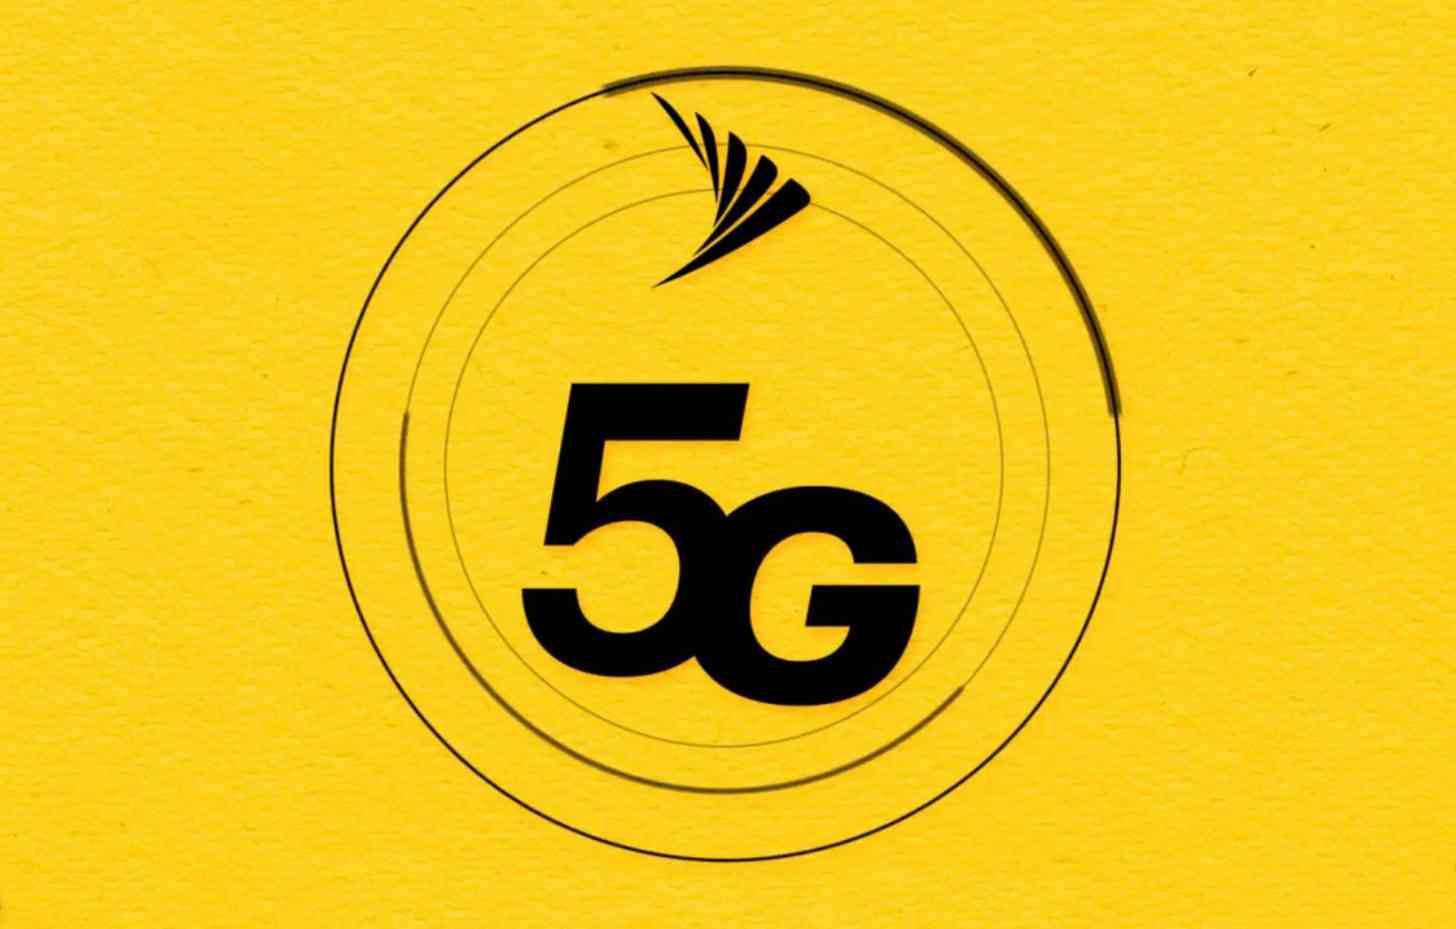 Sprint 5G logo